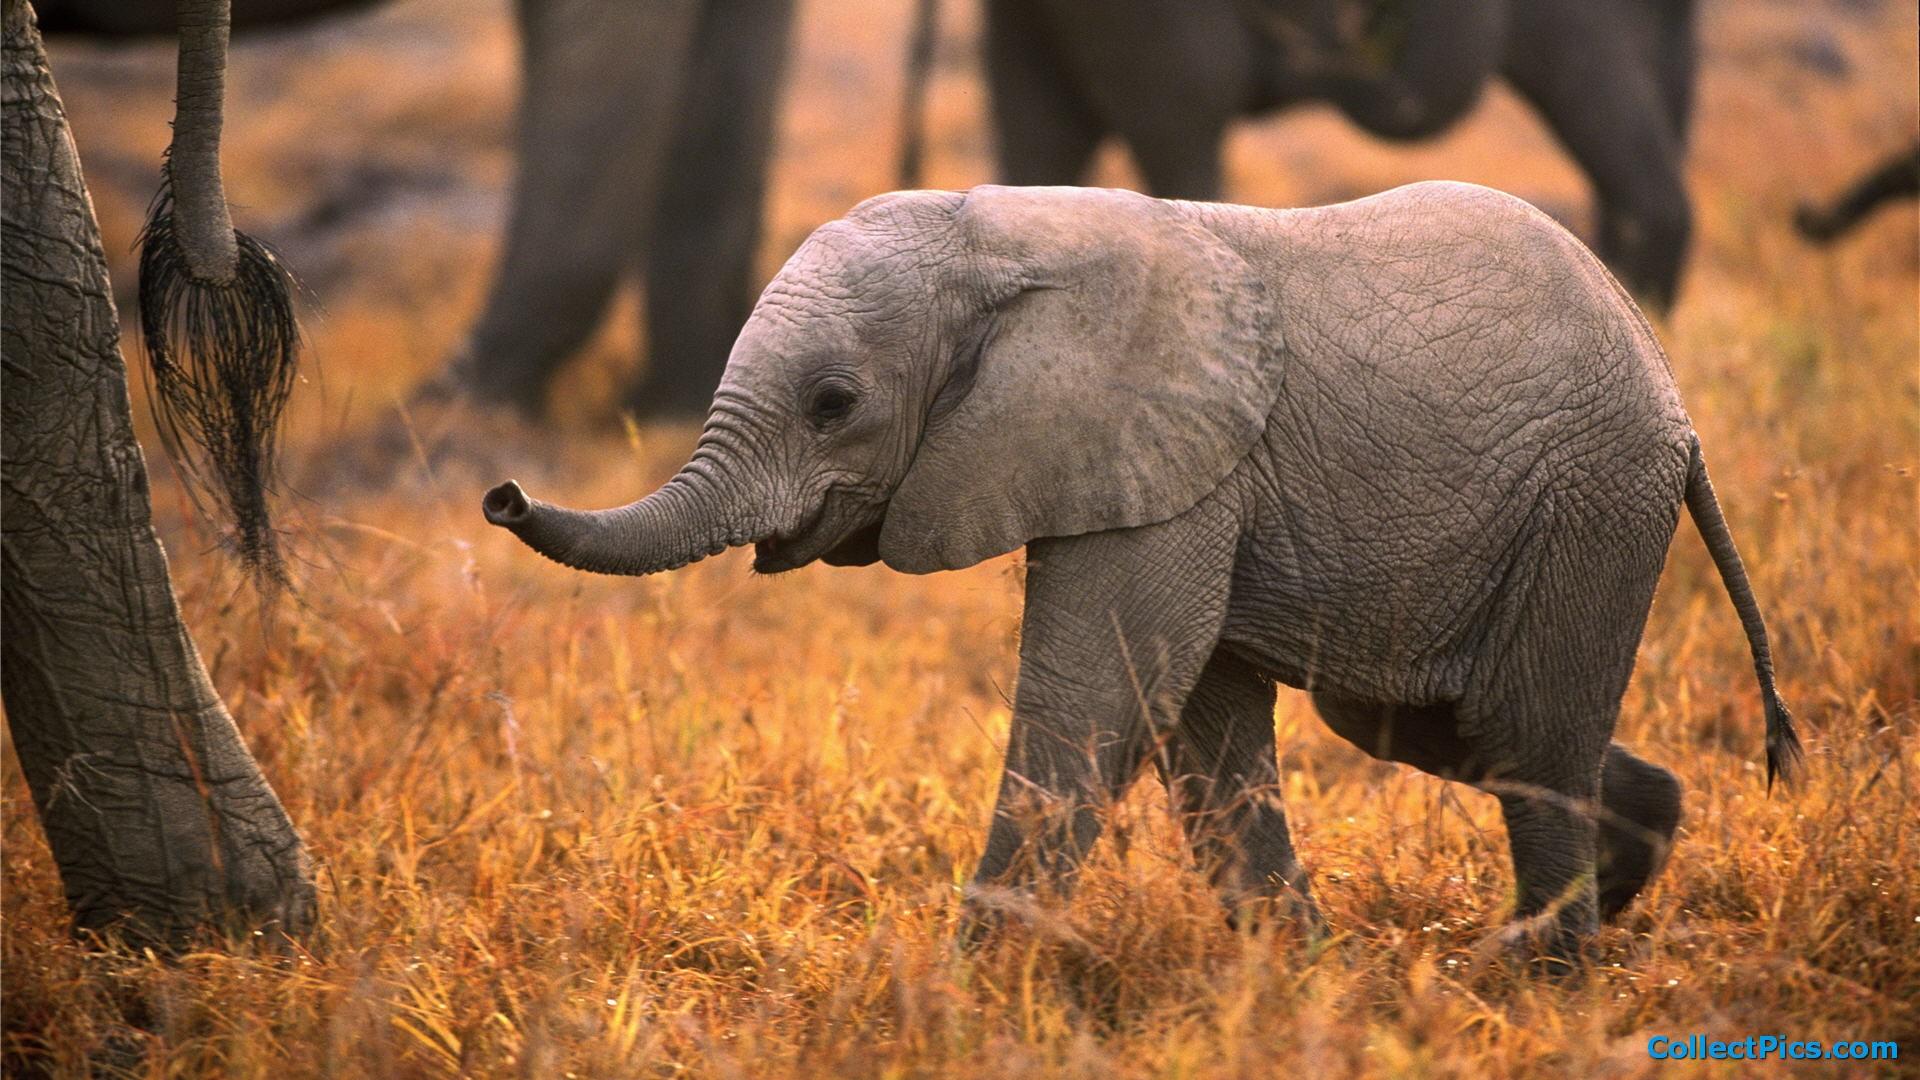 Baby elephant wallpaper cartoon wallpapersafari - Baby elephant wallpaper ...